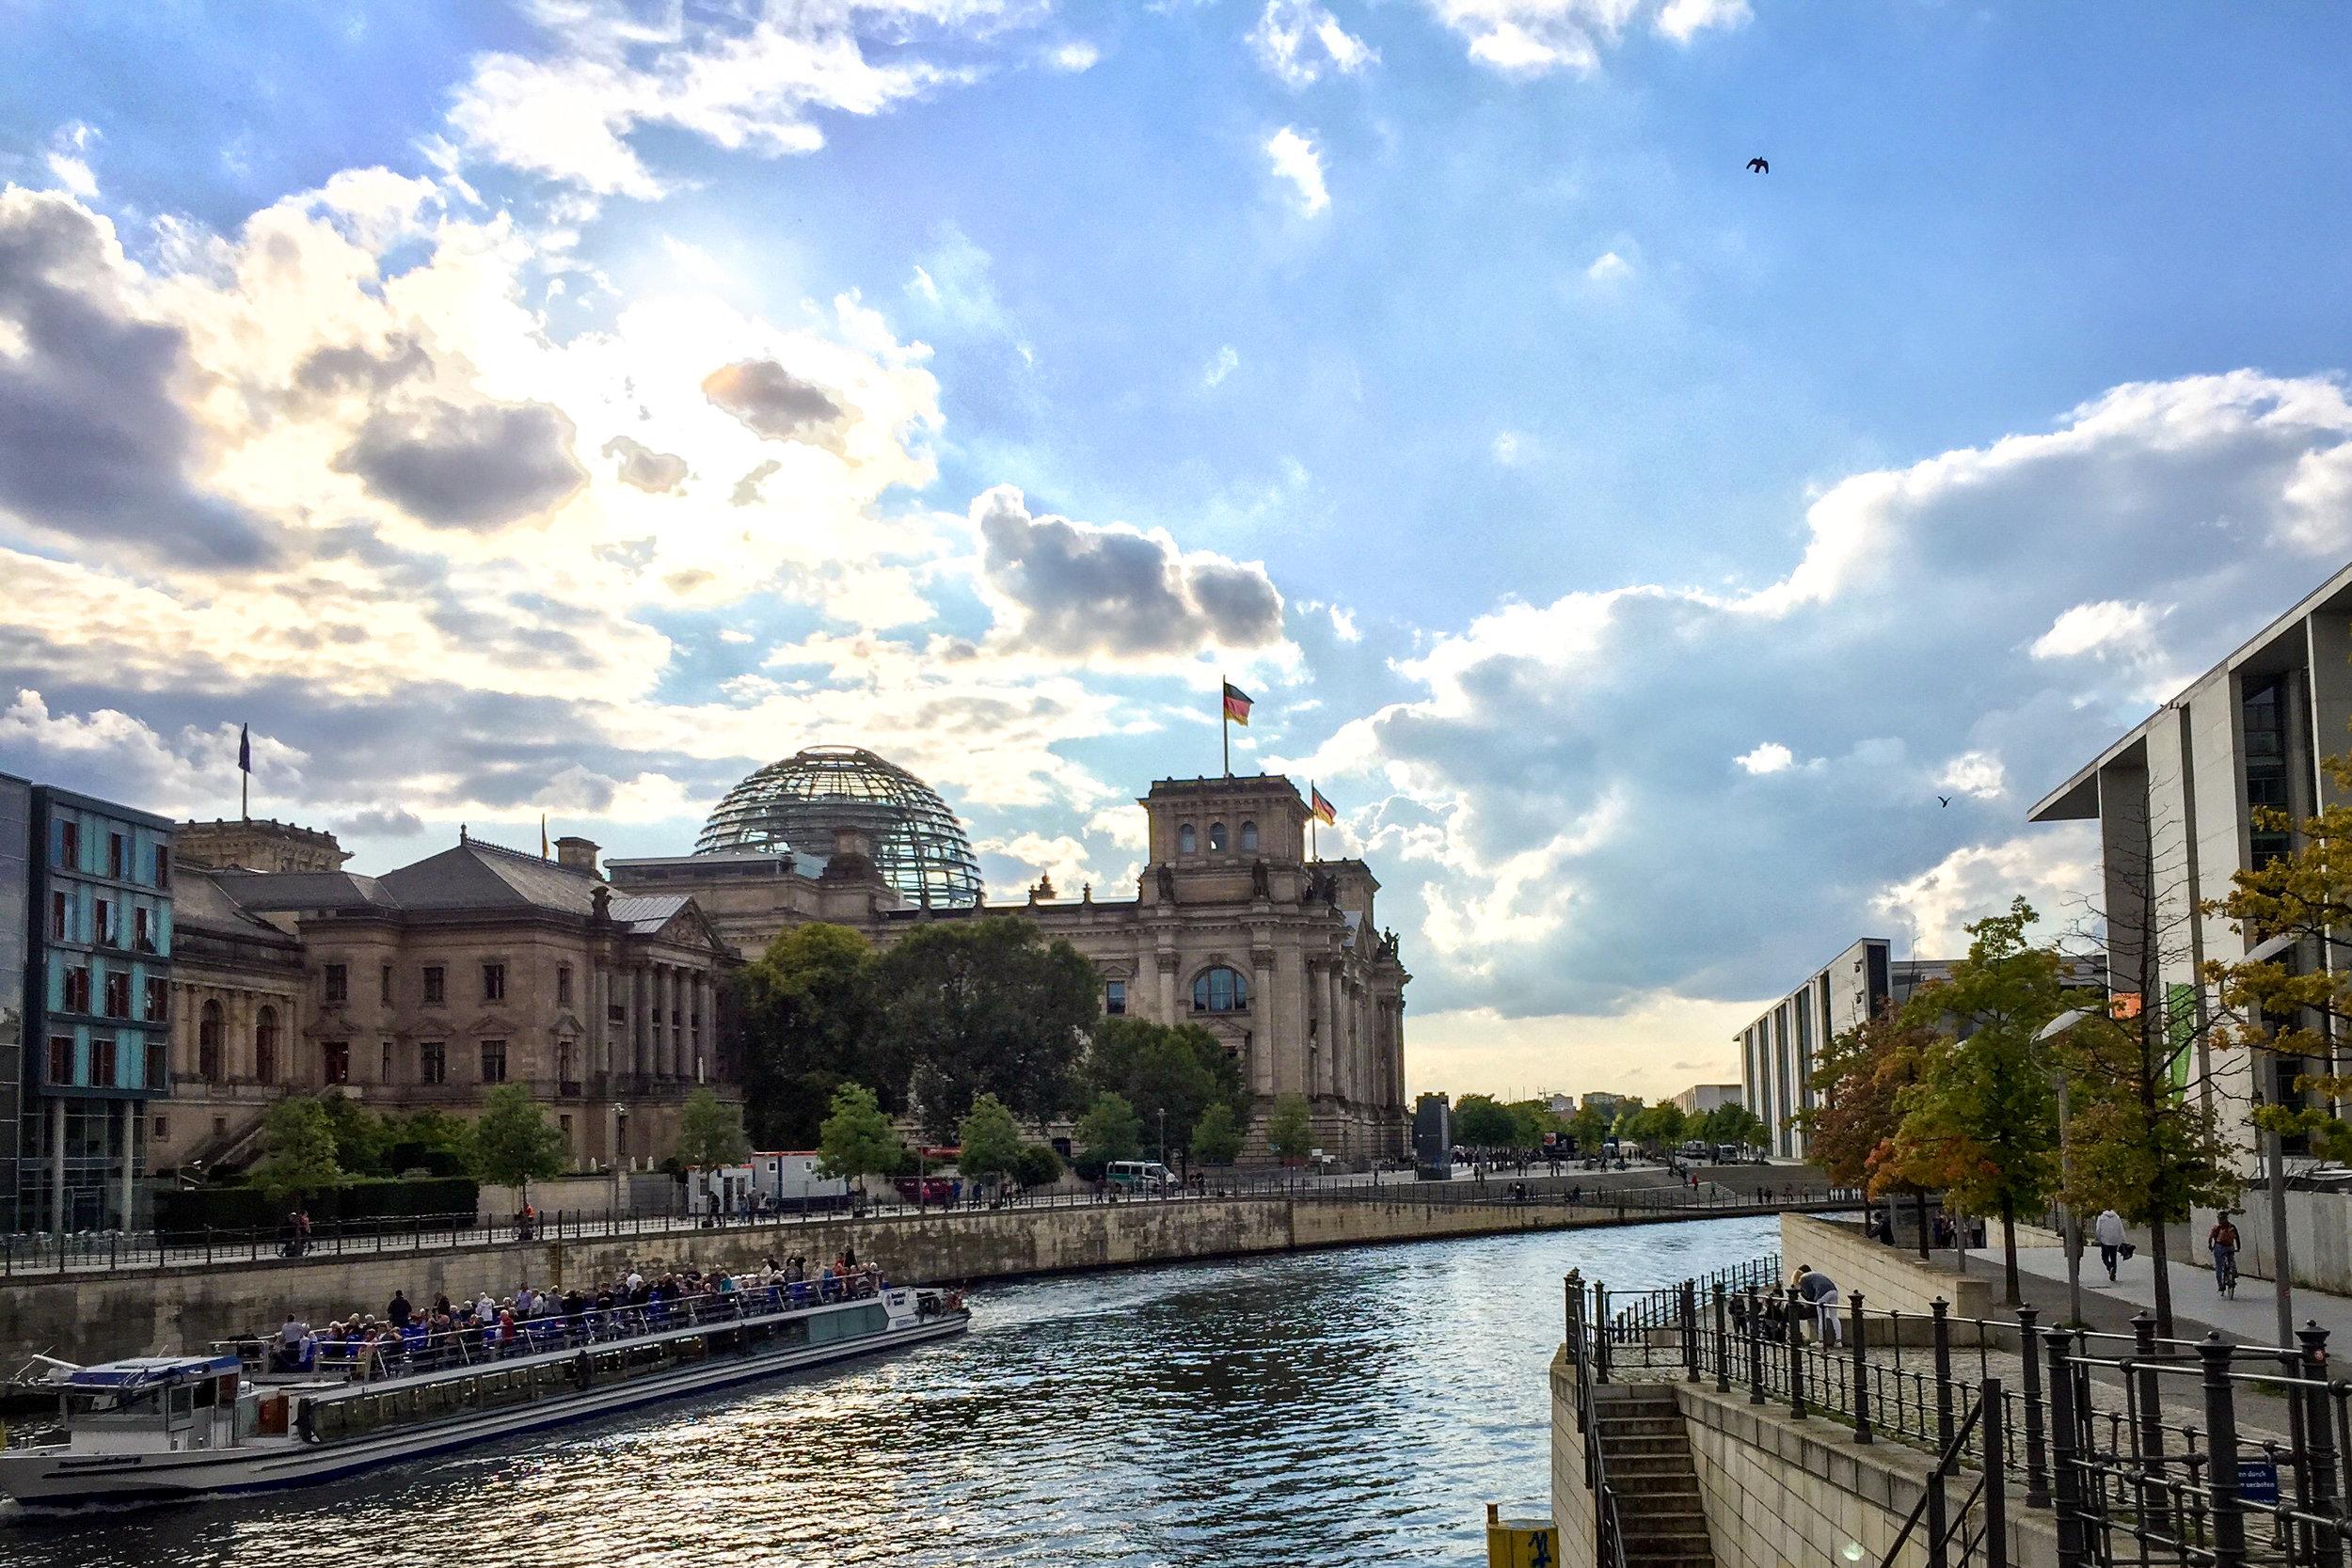 Germany_Berlin_River_The Caddy Wife.jpg